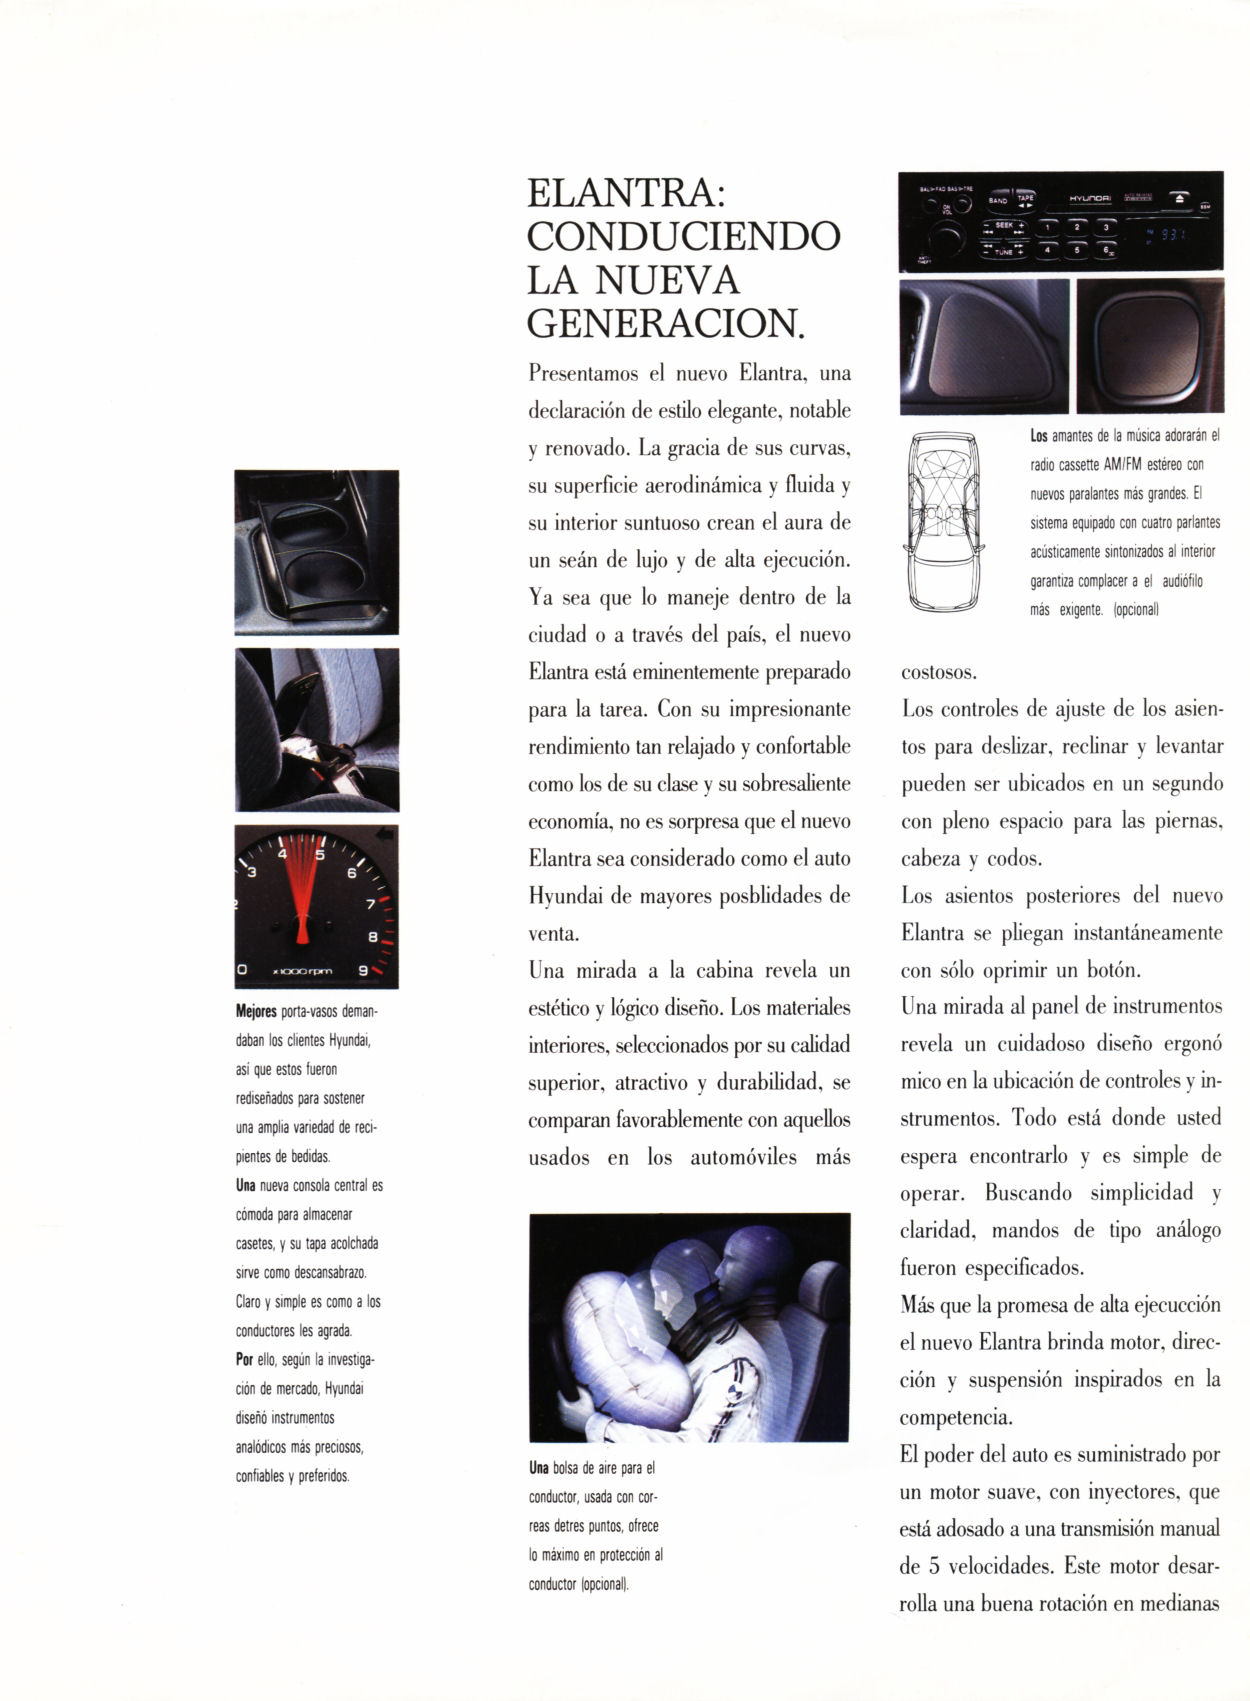 1994 Hyundai Elantra brochure